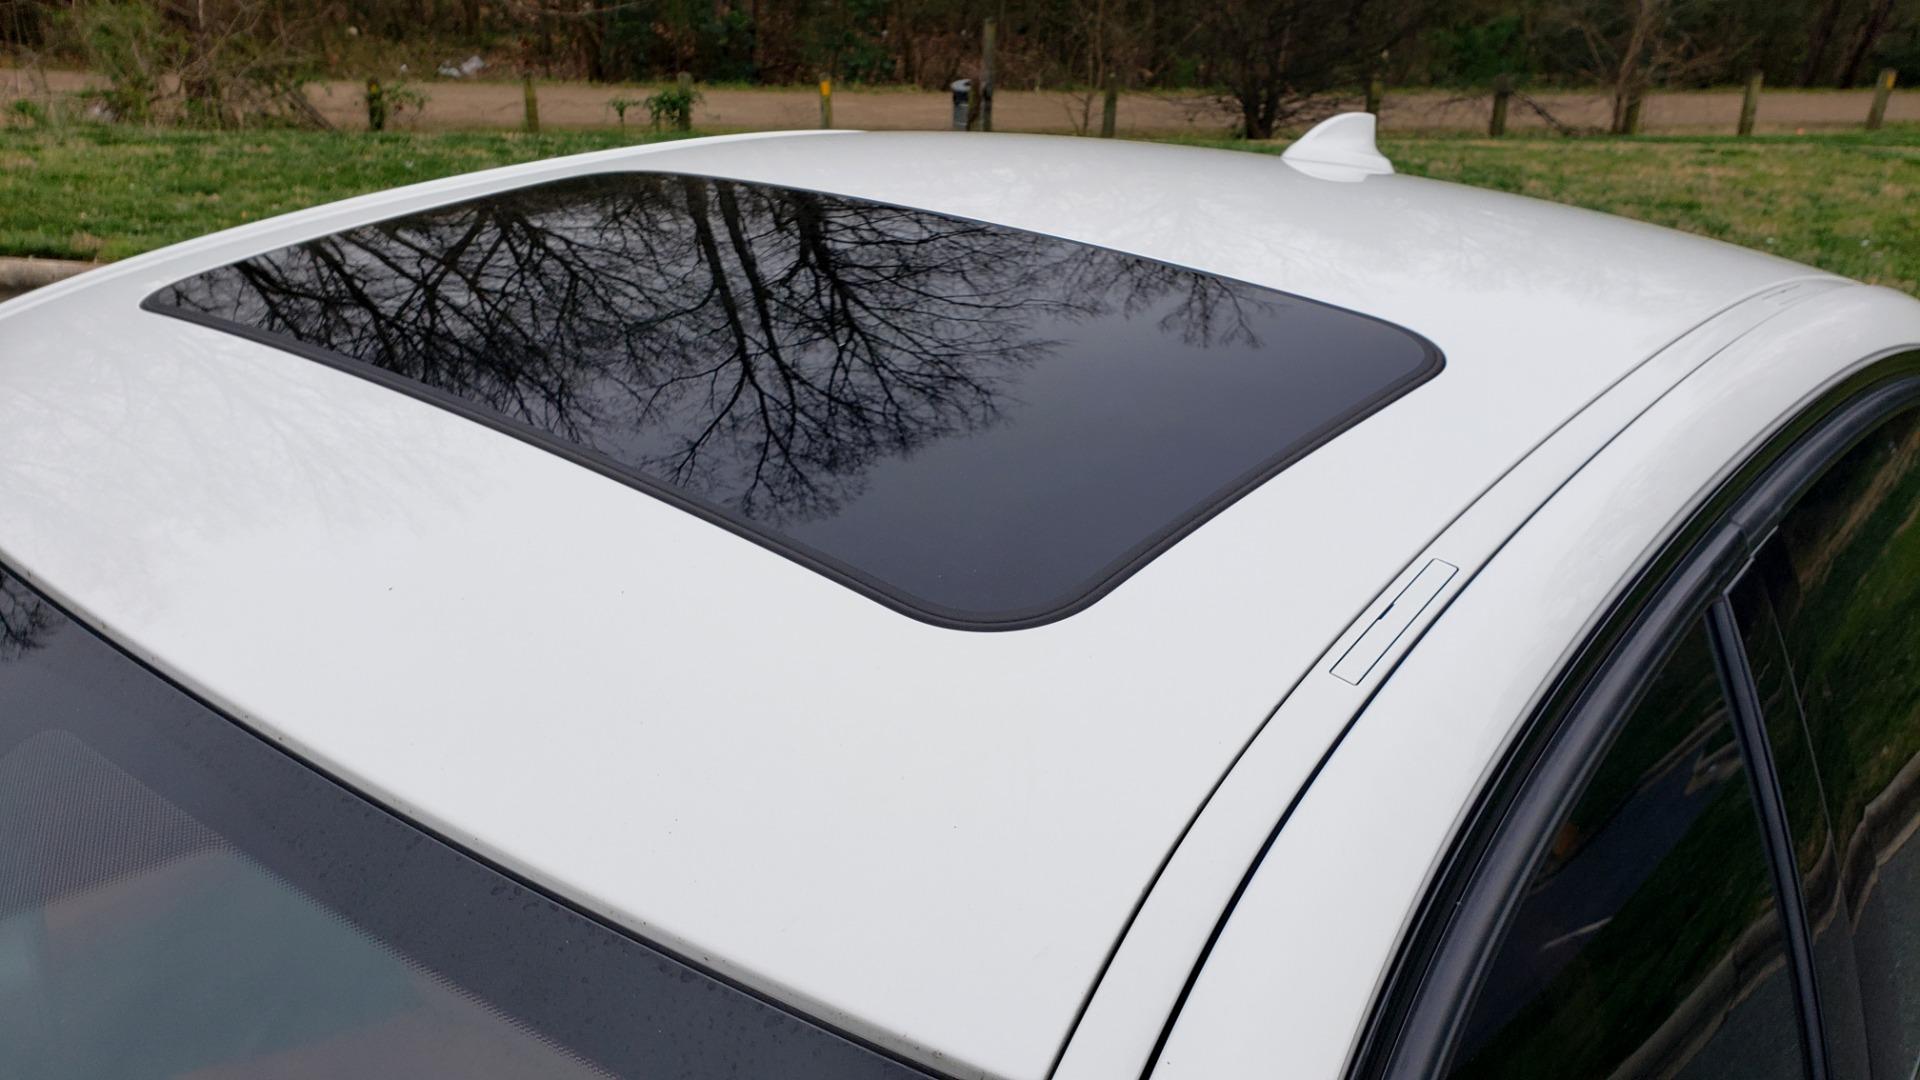 Used 2015 BMW 3 Series 335I M-SPORT / PREM PKG / HK SND / SUNROOF / REARVIEW for sale Sold at Formula Imports in Charlotte NC 28227 8